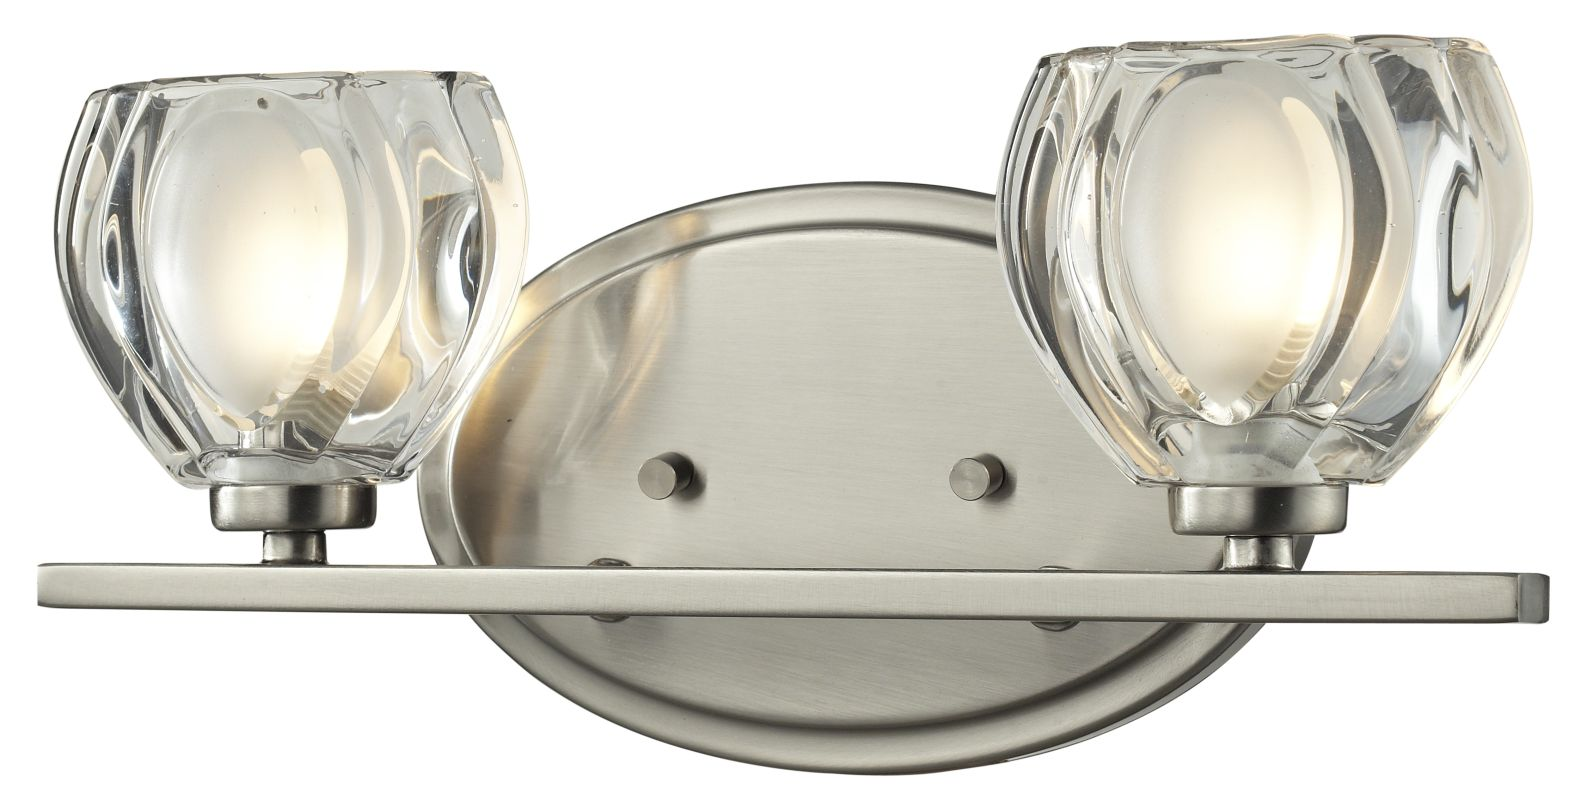 Z-Lite 3022-2V Hale 2 Light ADA Compliant Bathroom Vanity Light with